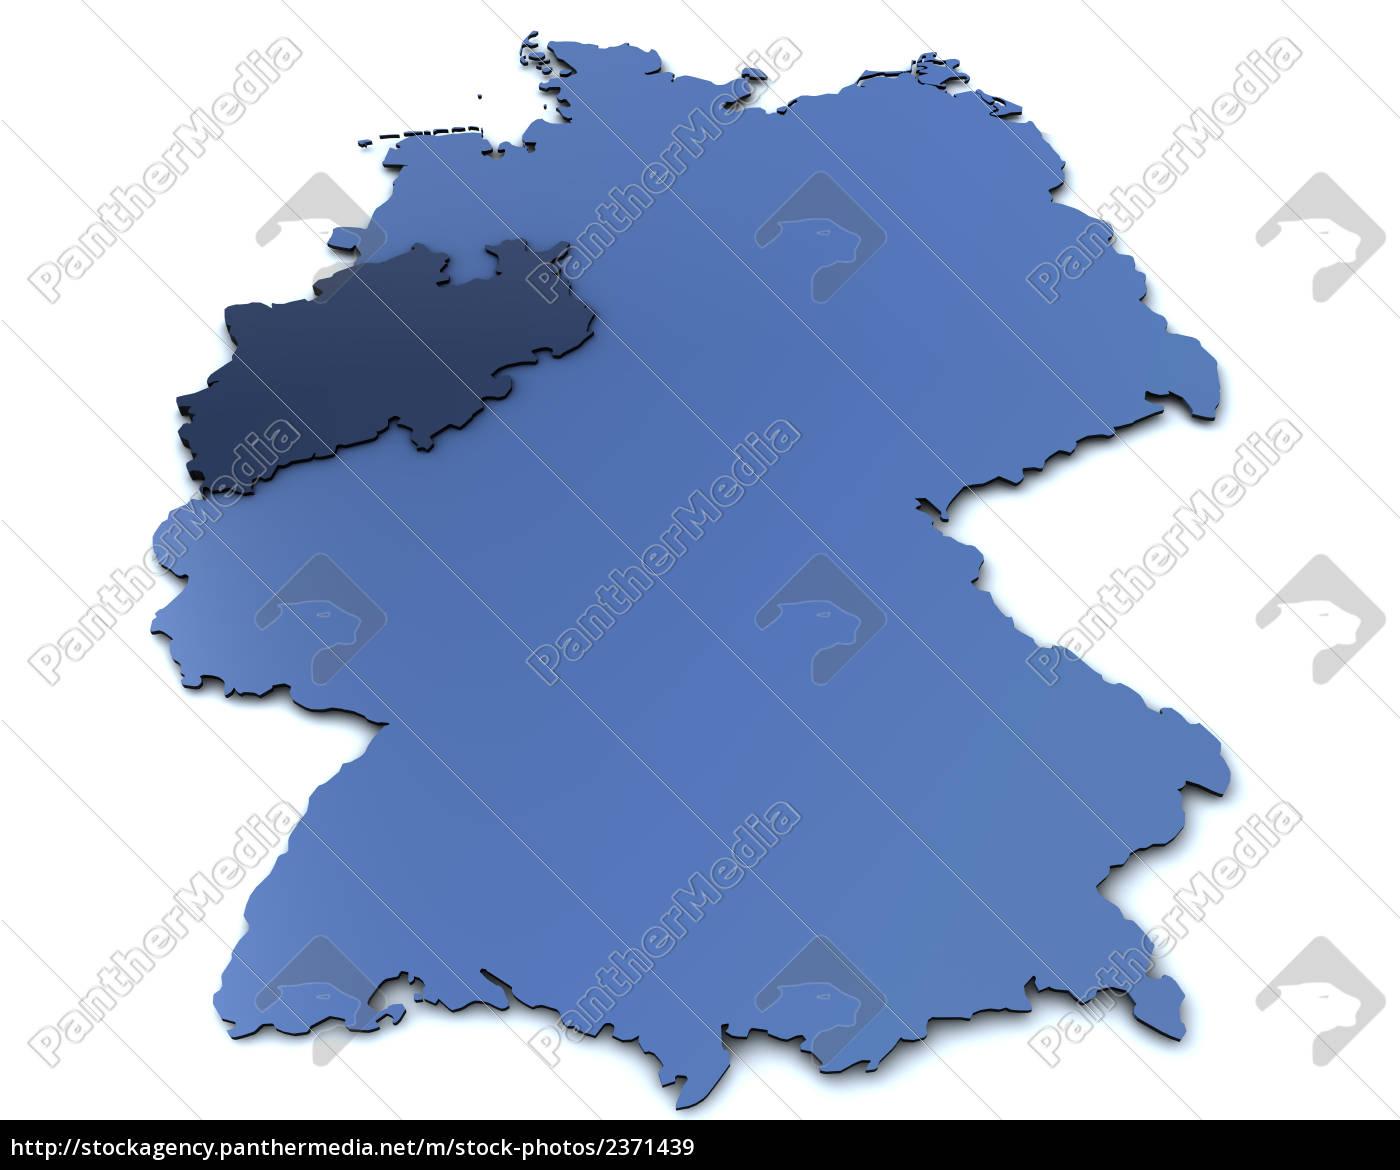 Online Kort Over Tyskland Nrw Royalty Free Image 2371439